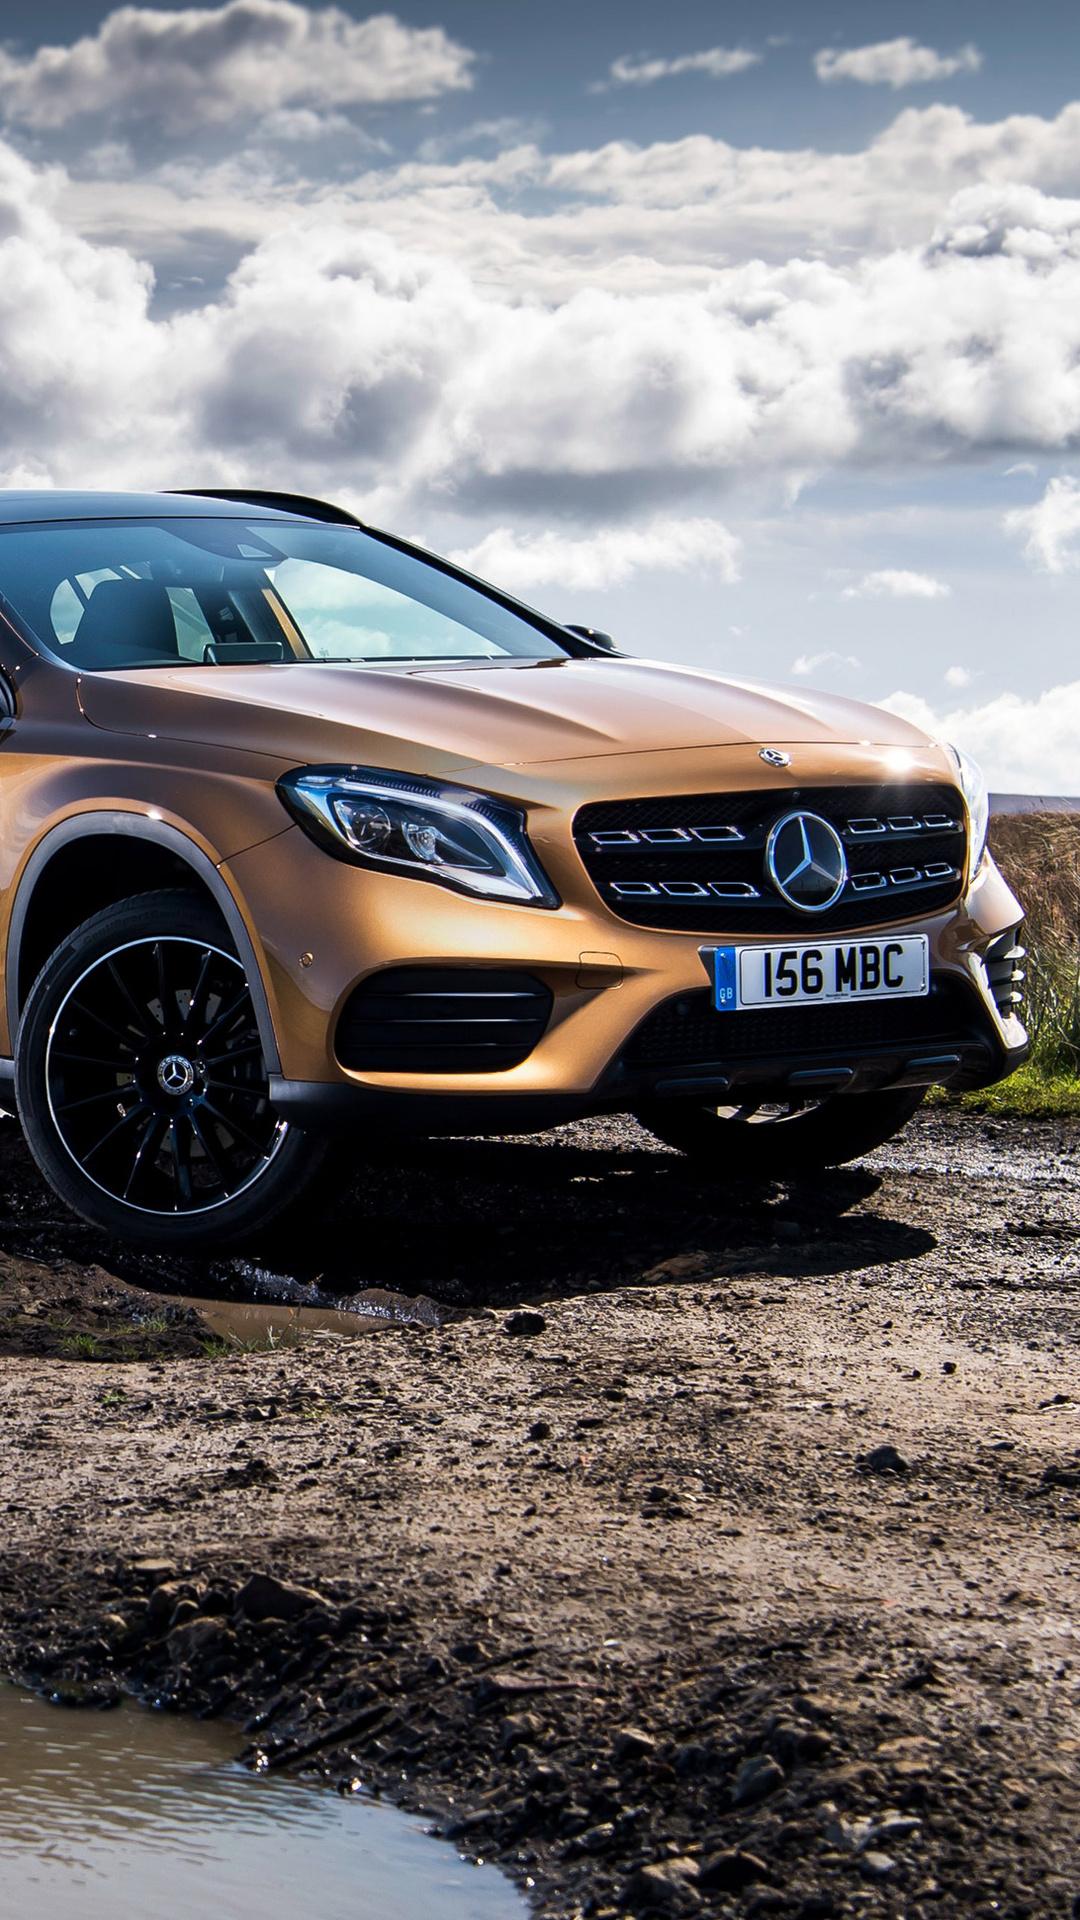 1080x1920 Mercedes Benz Gla 220 D 4matic Amg Line 2017 Iphone 7 6s